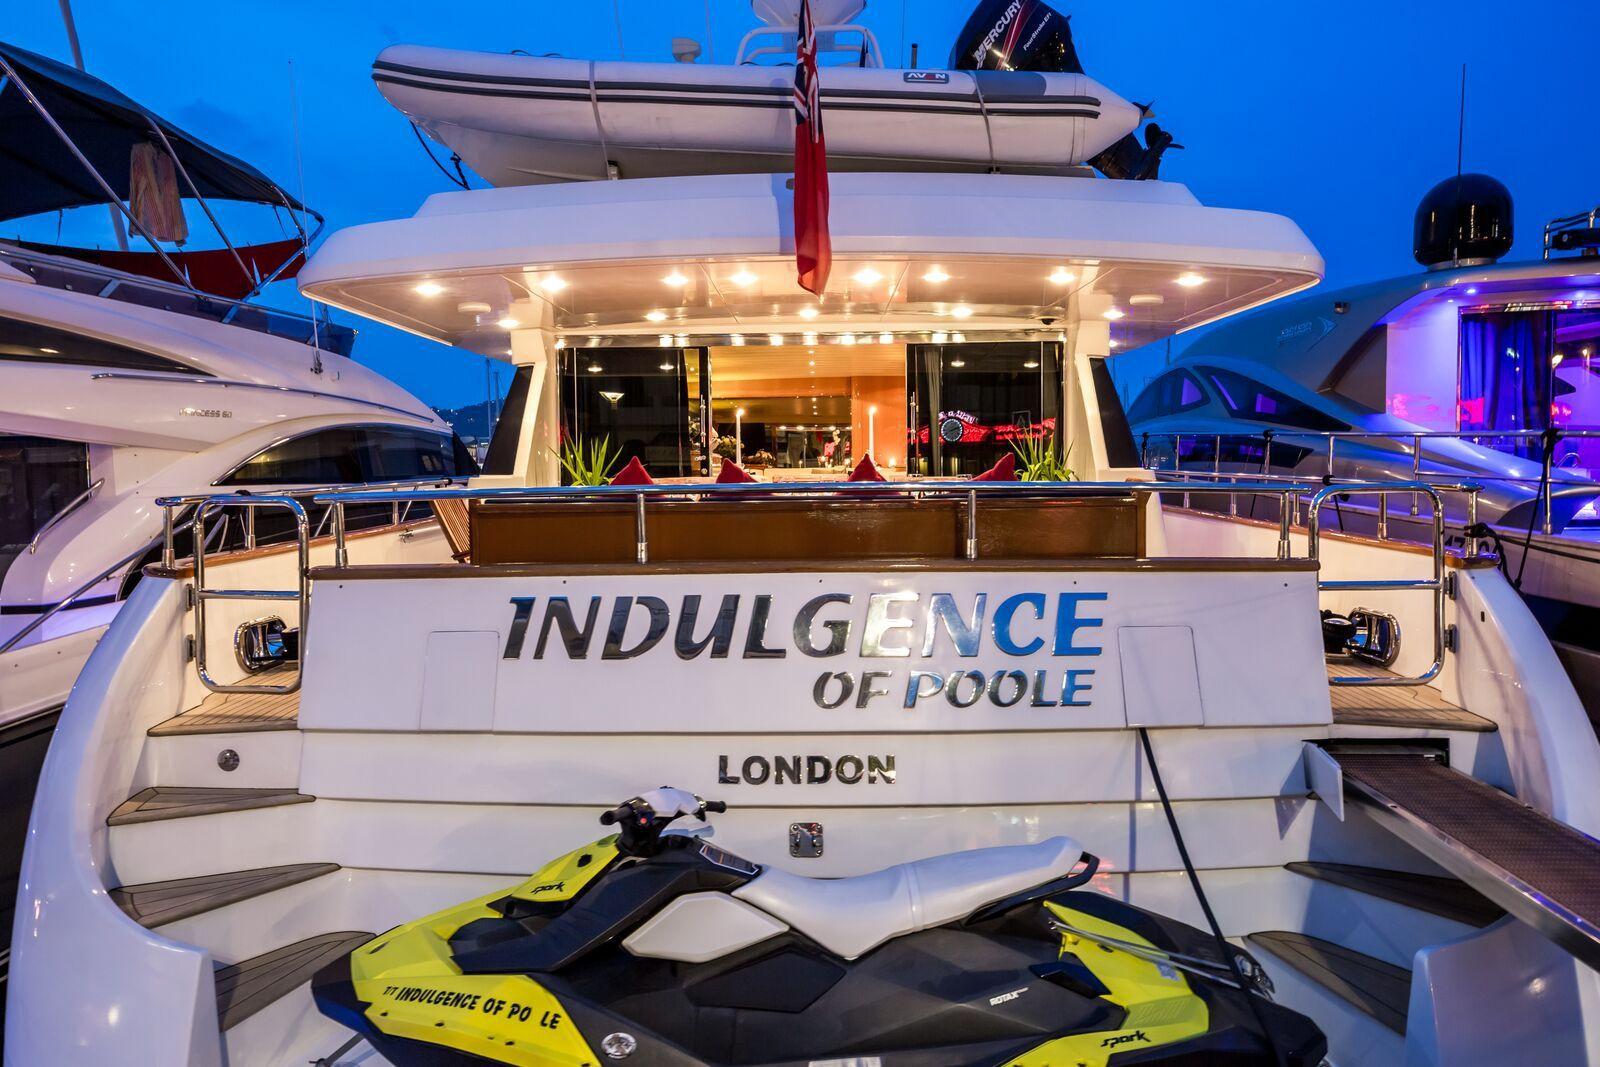 INDULGENCE OF POOLE Mangusta 86 Luxury Superyacht Aft Deck